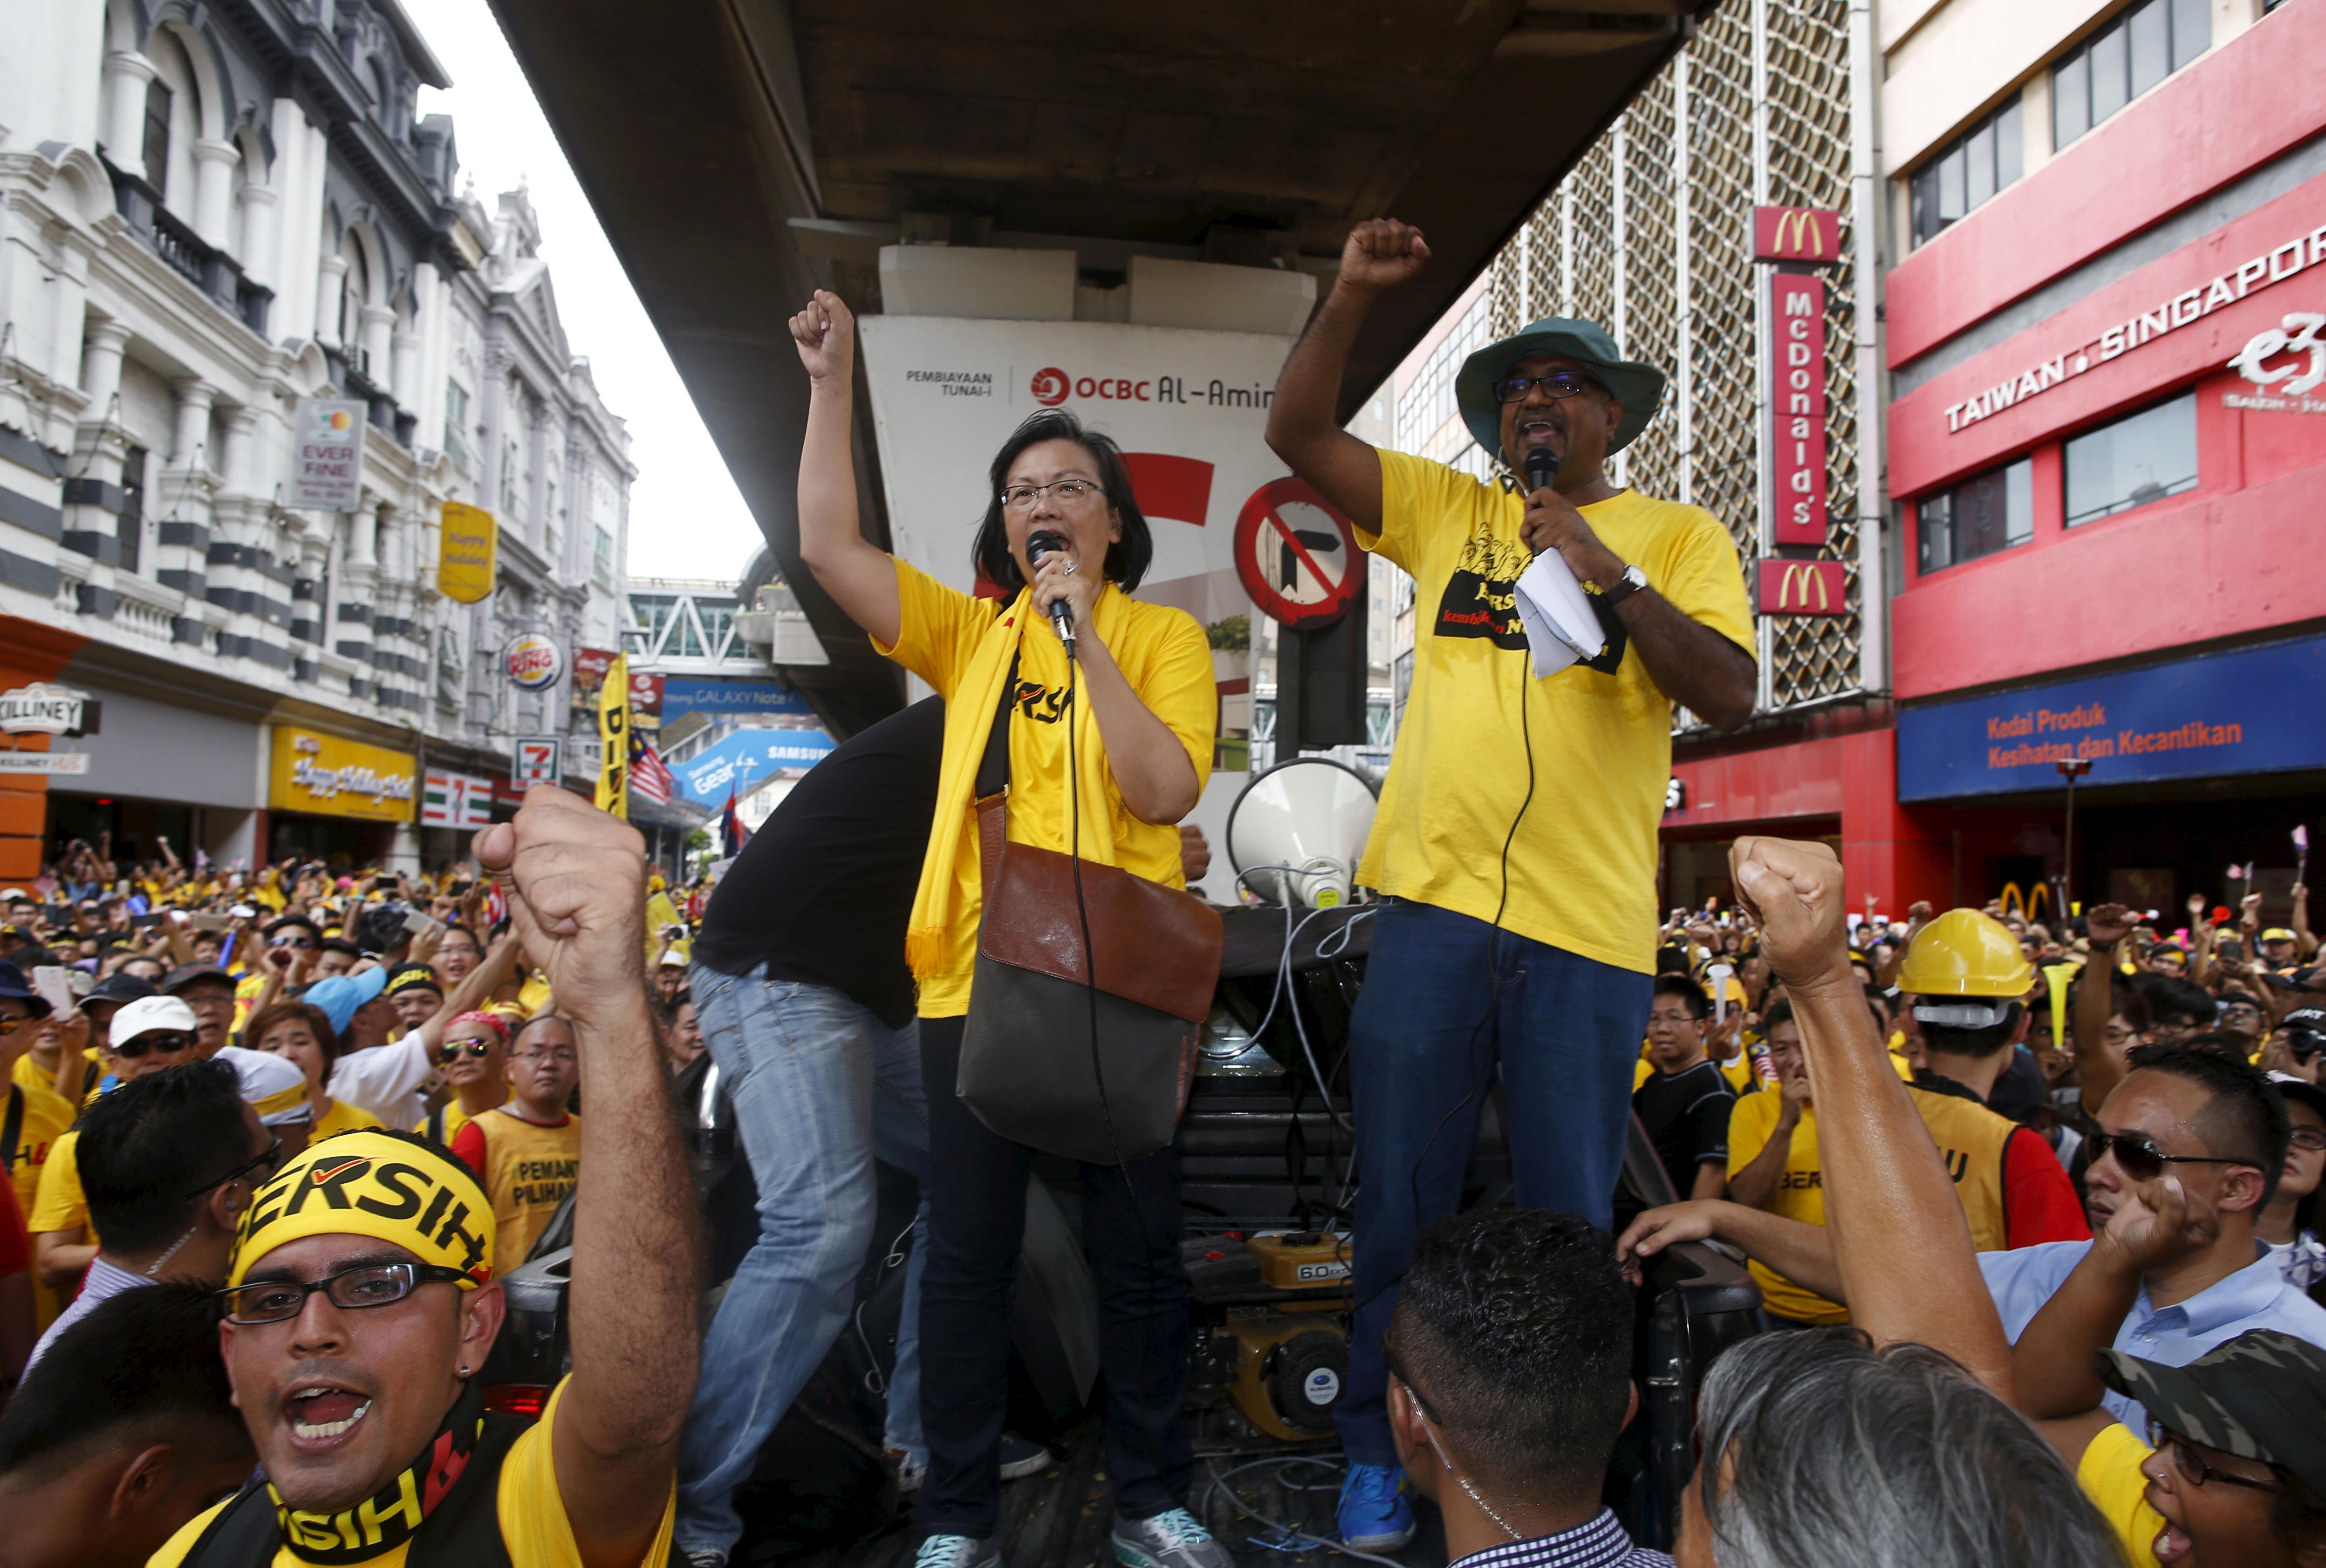 Malaysian pro-democracy group Bersih  chairwoman Maria Chin Abdullah, center, rallies supporters as they prepare to march towards Dataran Merdeka in Kuala Lumpur on Aug. 29, 2015